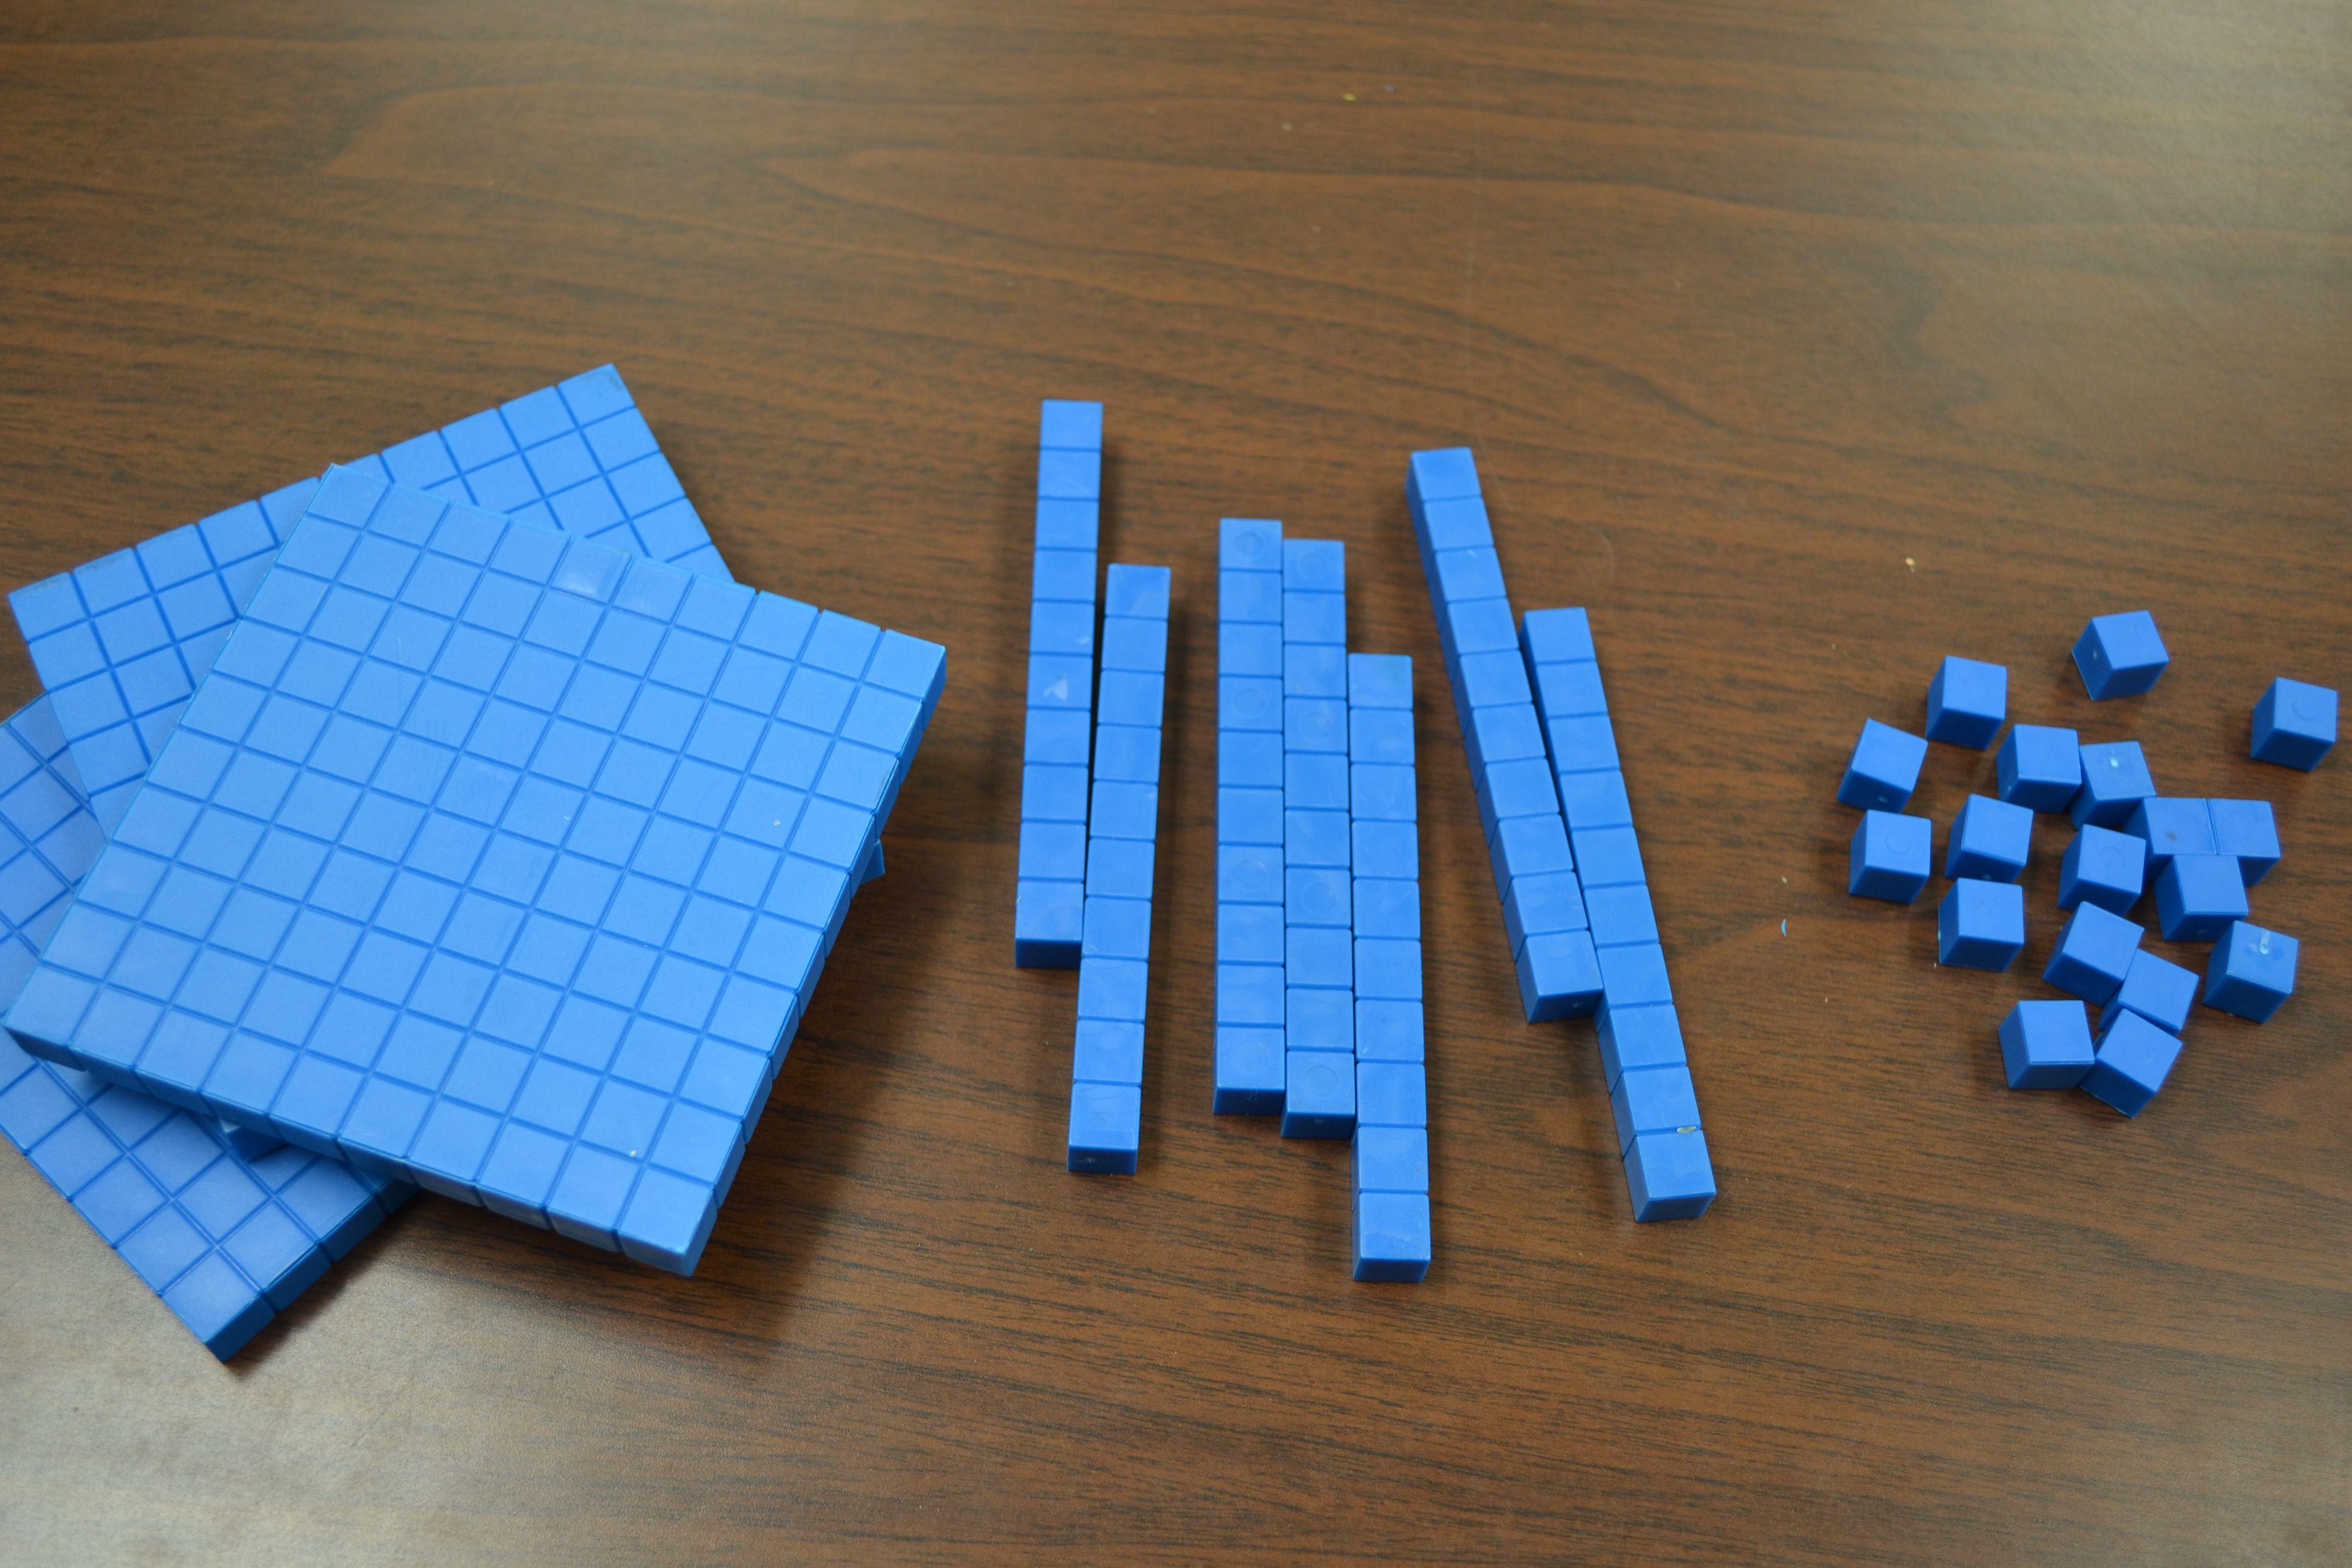 comparing and ordering decimals ying ordering decimals teaching decimals math lessons. Black Bedroom Furniture Sets. Home Design Ideas